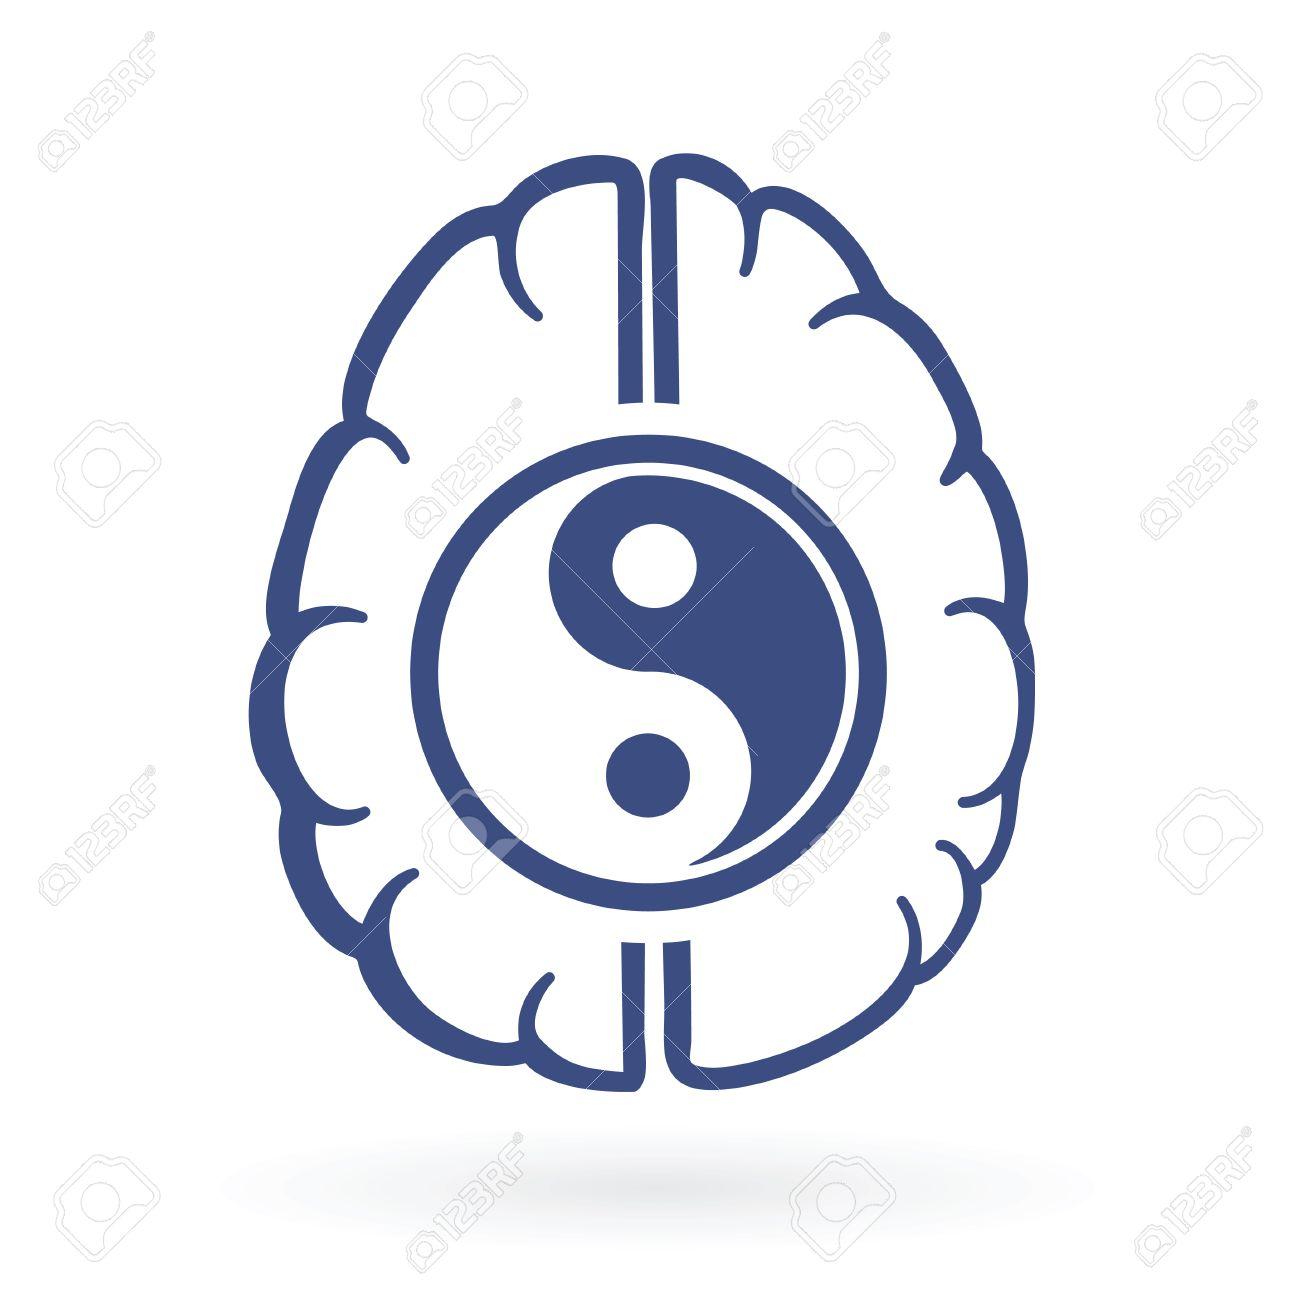 Ying yang and human brain symbols as positive energy life balance ying yang and human brain symbols as positive energy life balance concept vector illustration biocorpaavc Images